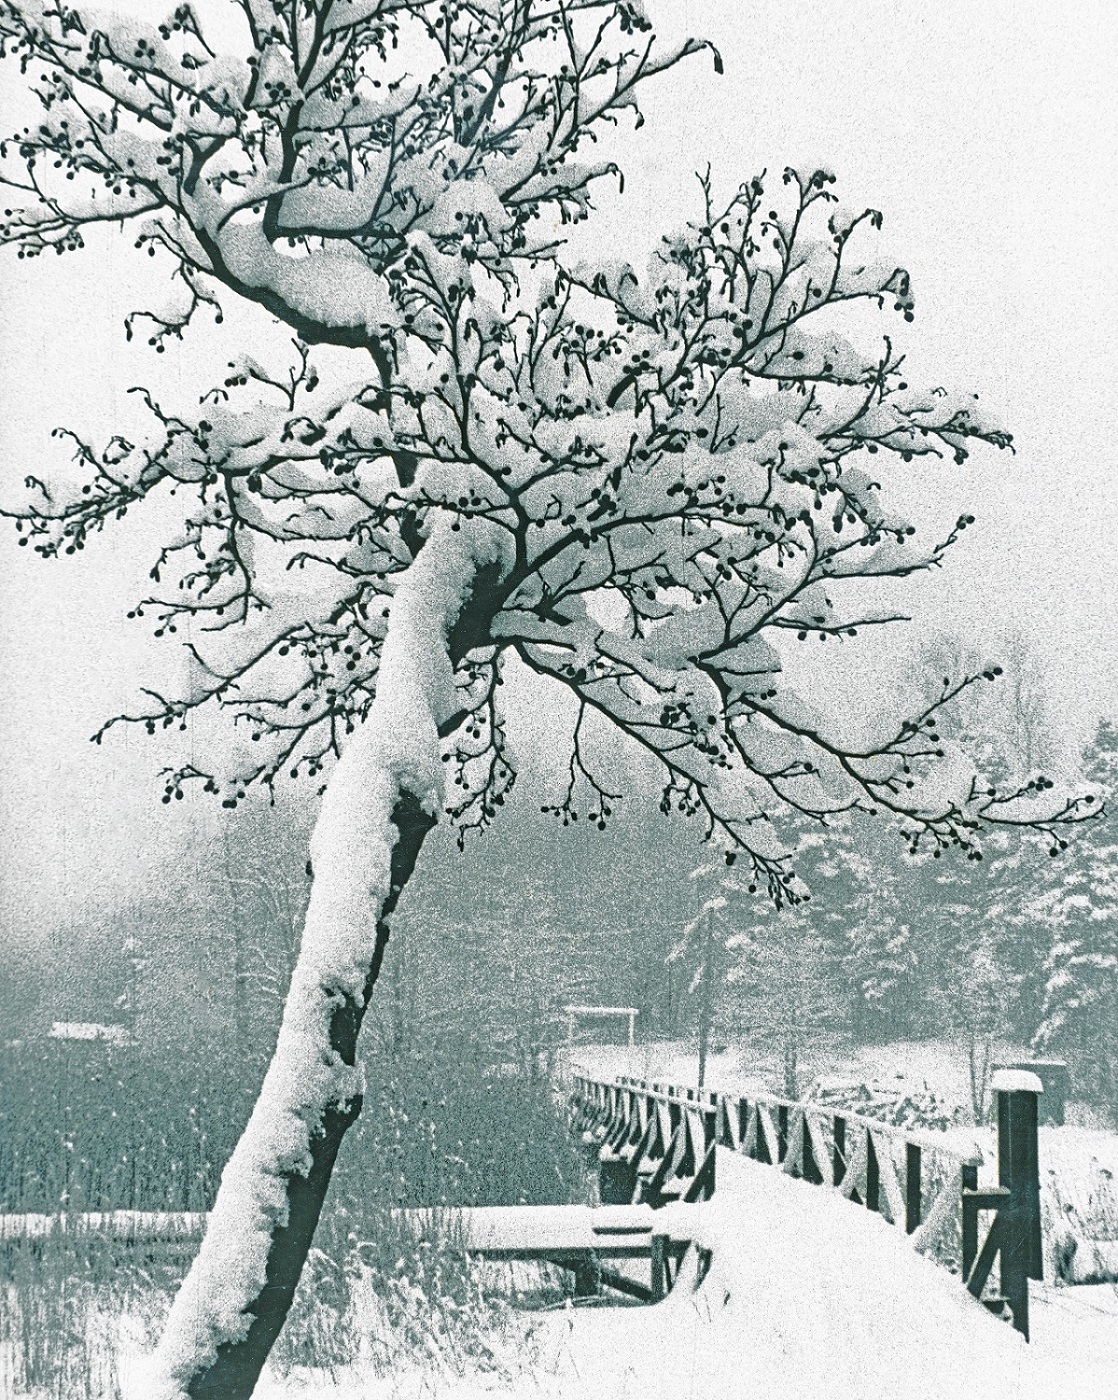 Nimi: Talvi2, Kuvaaja: Kari Heino